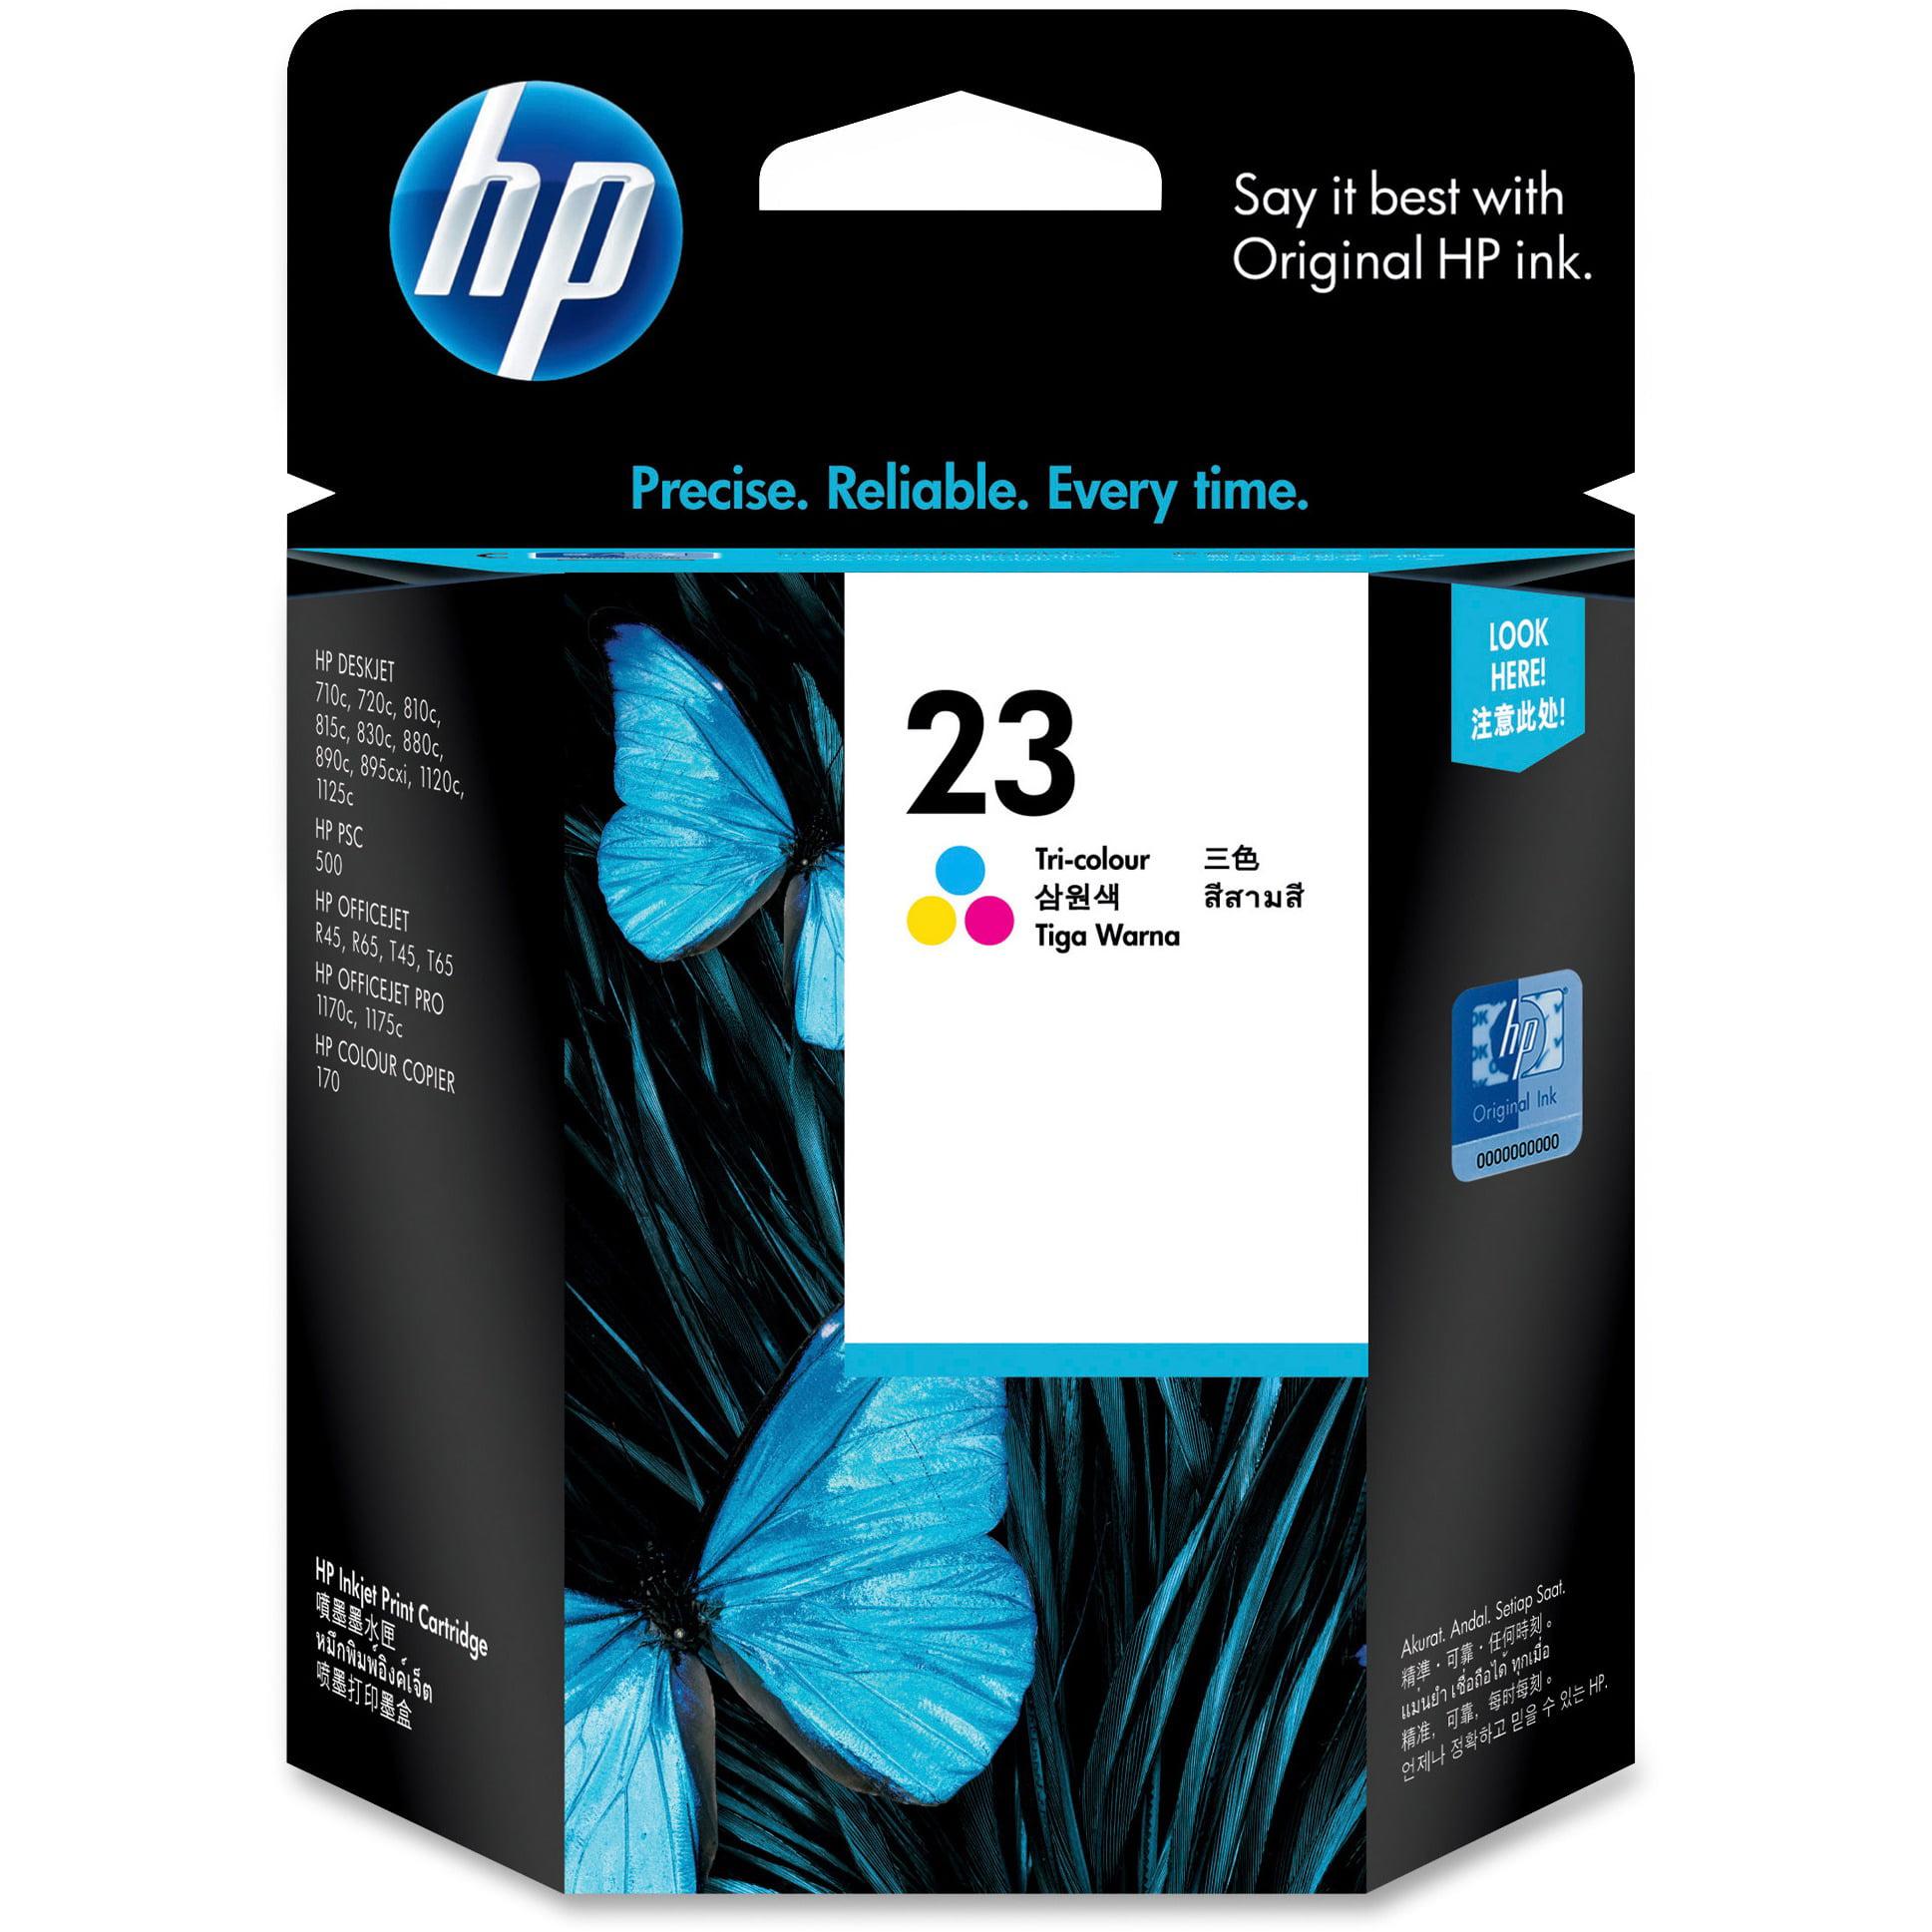 HP, HEWC1823D, C1823D Color Ink Cartridge, 1 Each